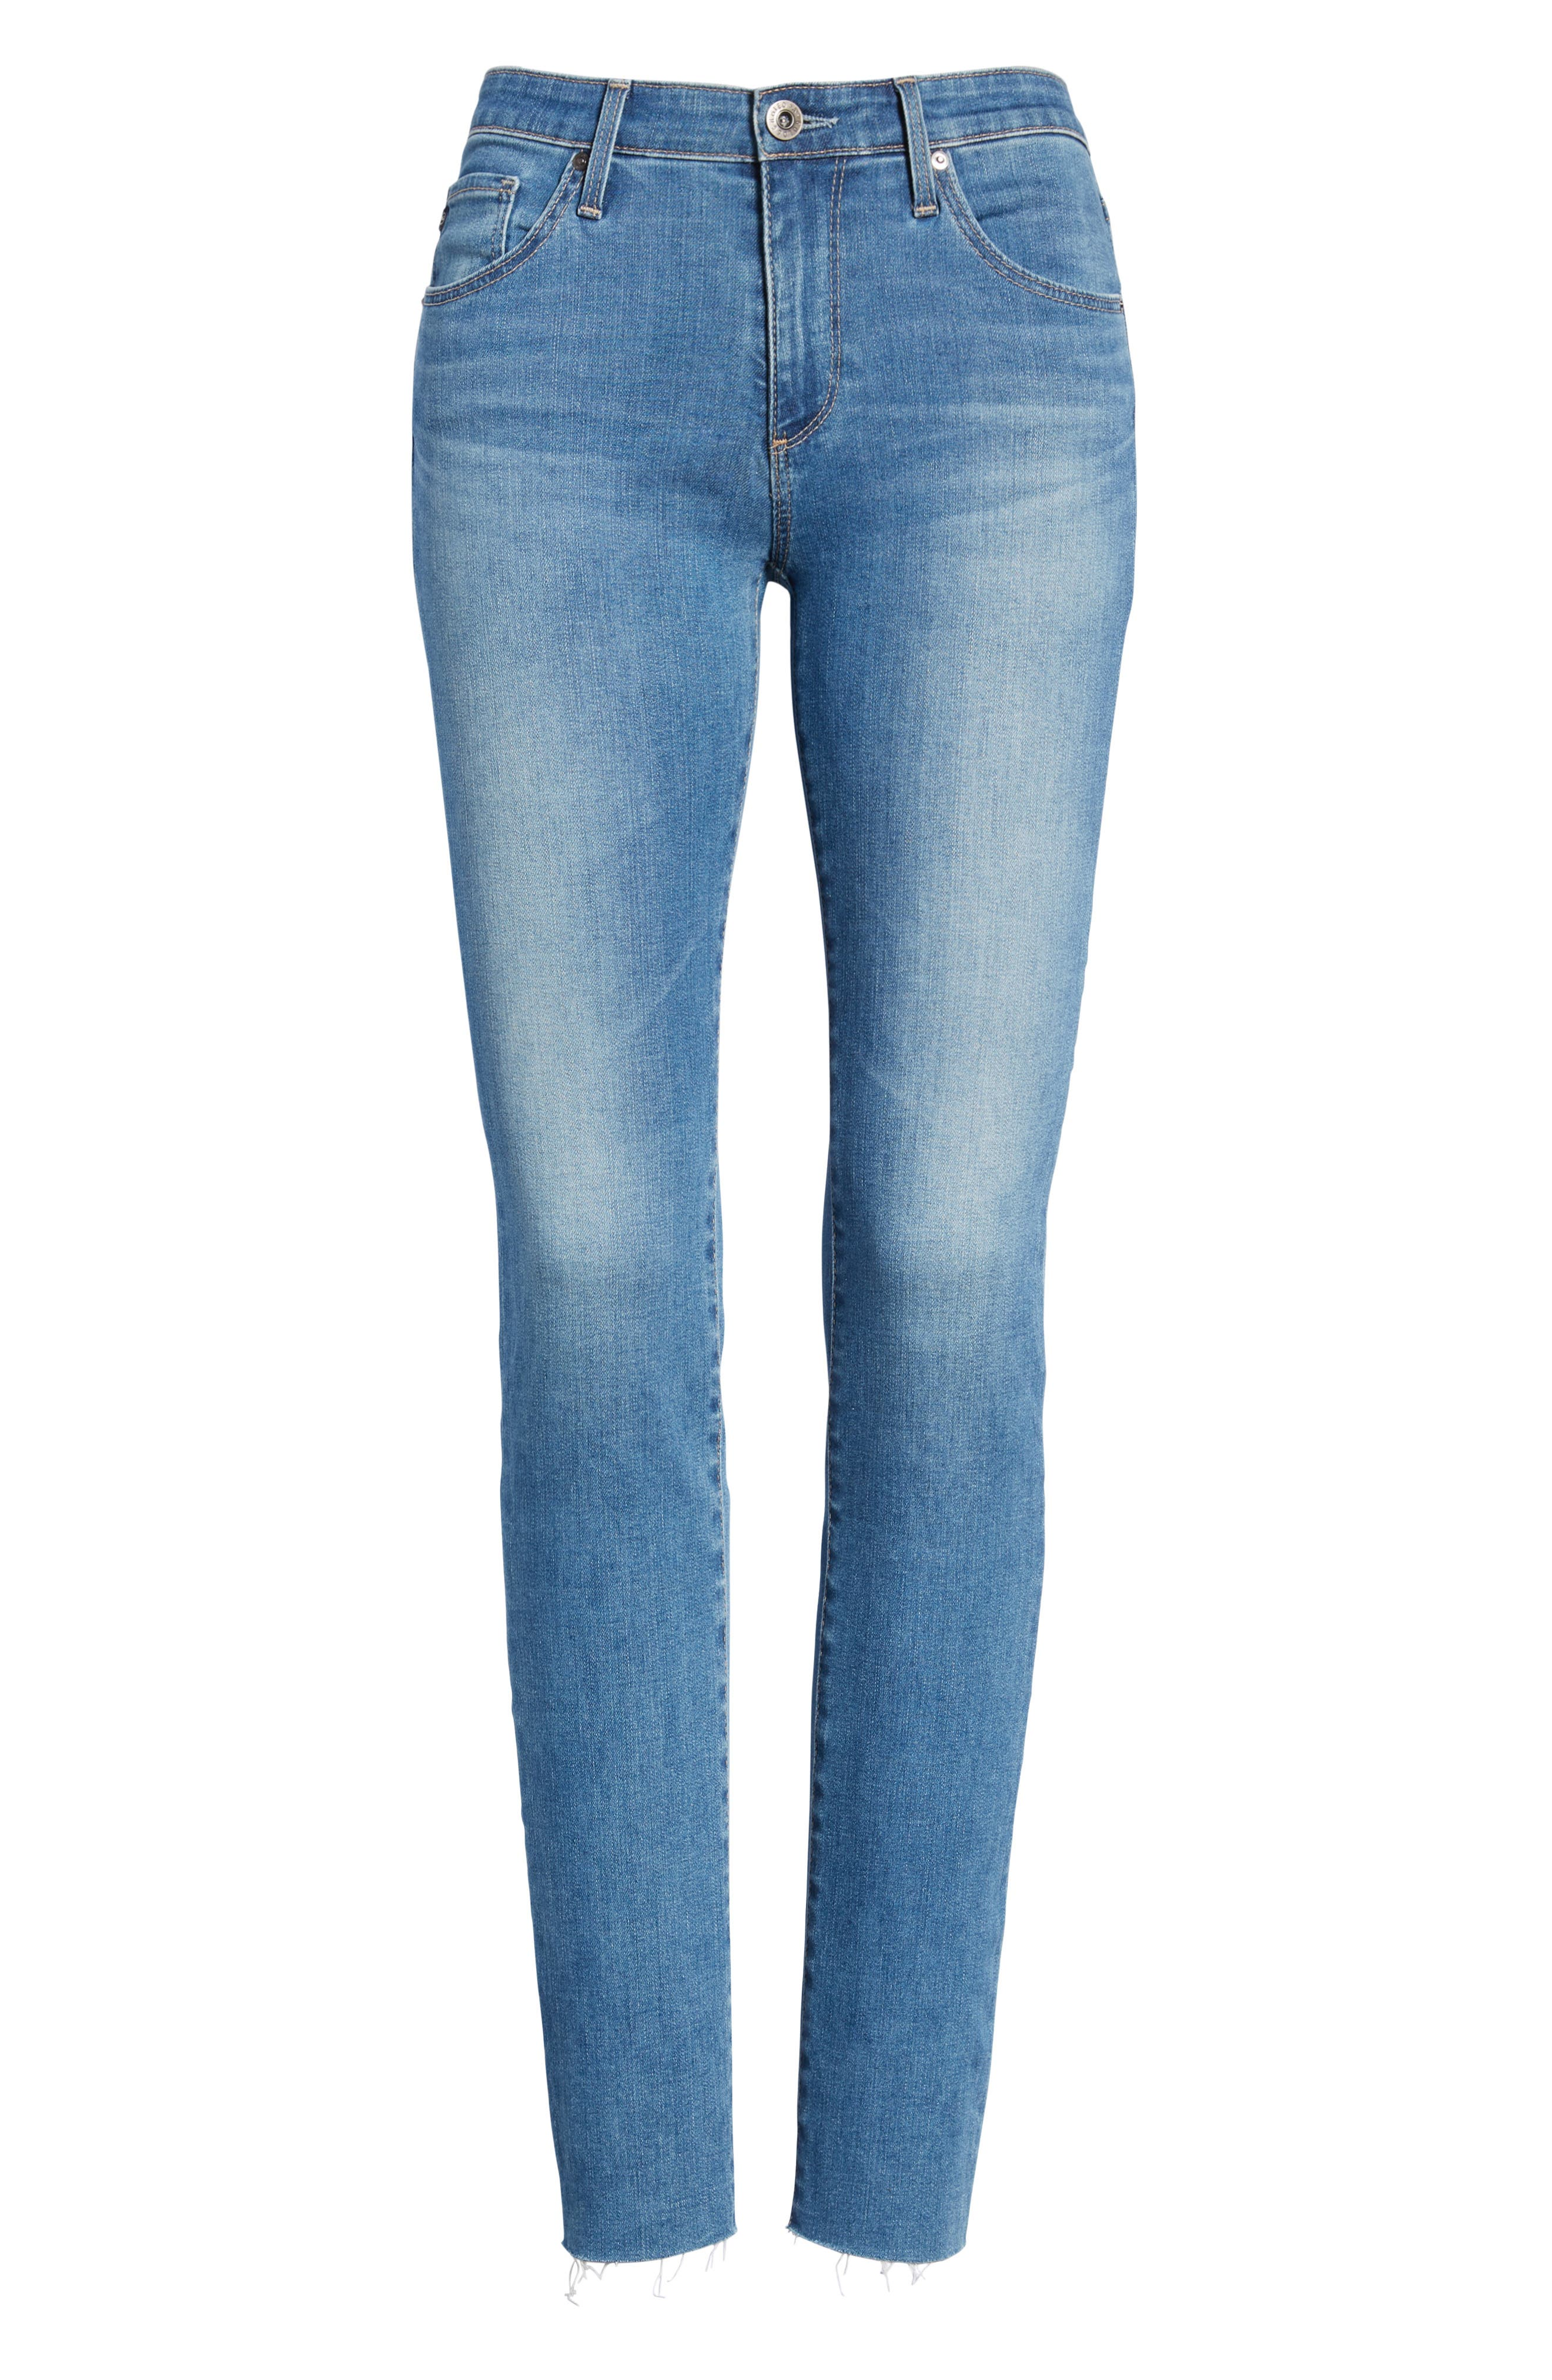 Hoxton High Waist Ankle Peg Jeans,                             Alternate thumbnail 7, color,                             KAYSON DISTRESSED